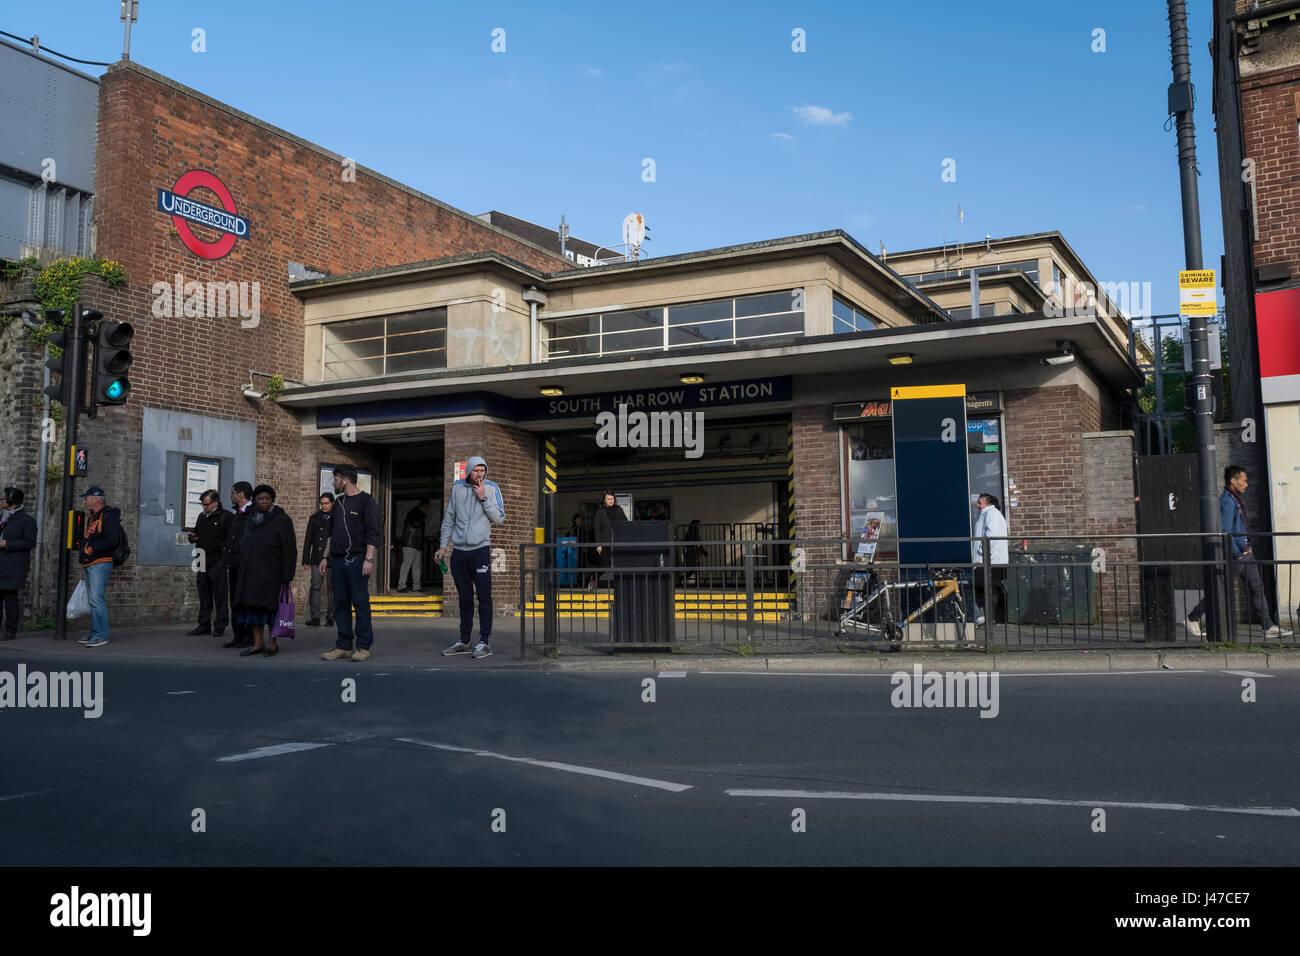 South Harrow station - Stock Image